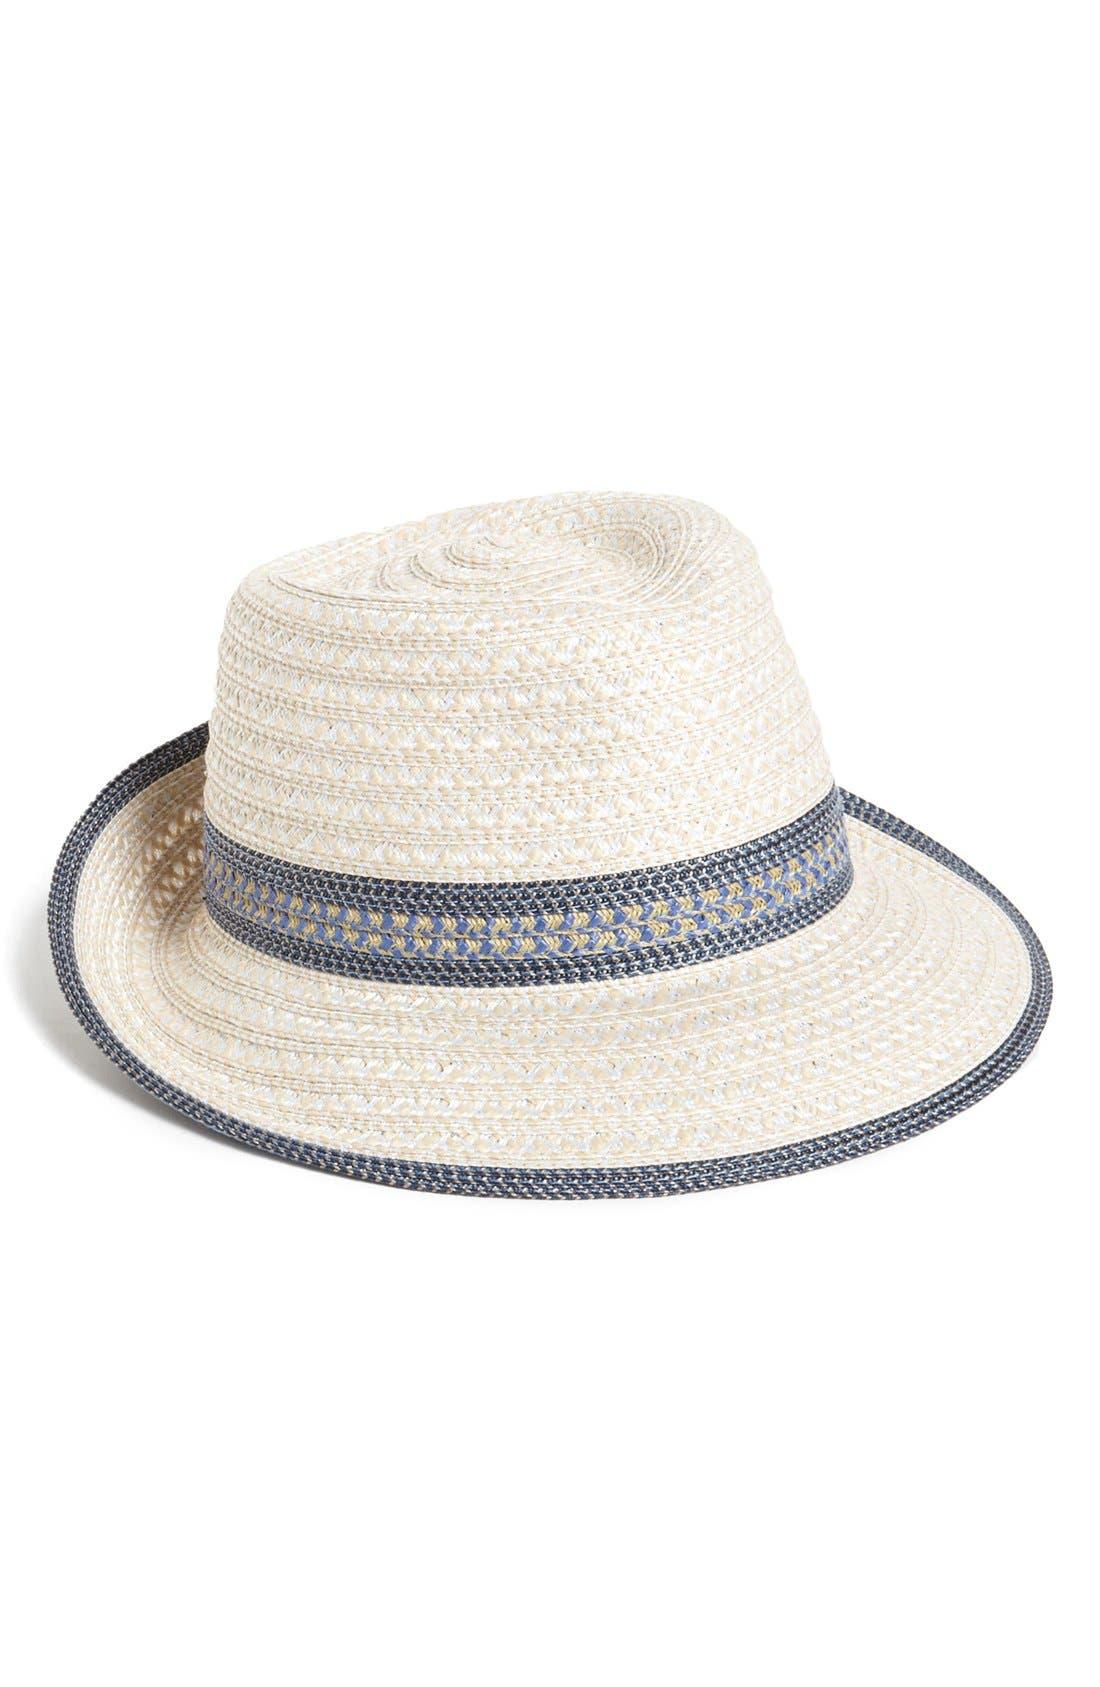 Squishee<sup>®</sup> Straw Fedora,                             Main thumbnail 1, color,                             Cream/ Blue Tweed